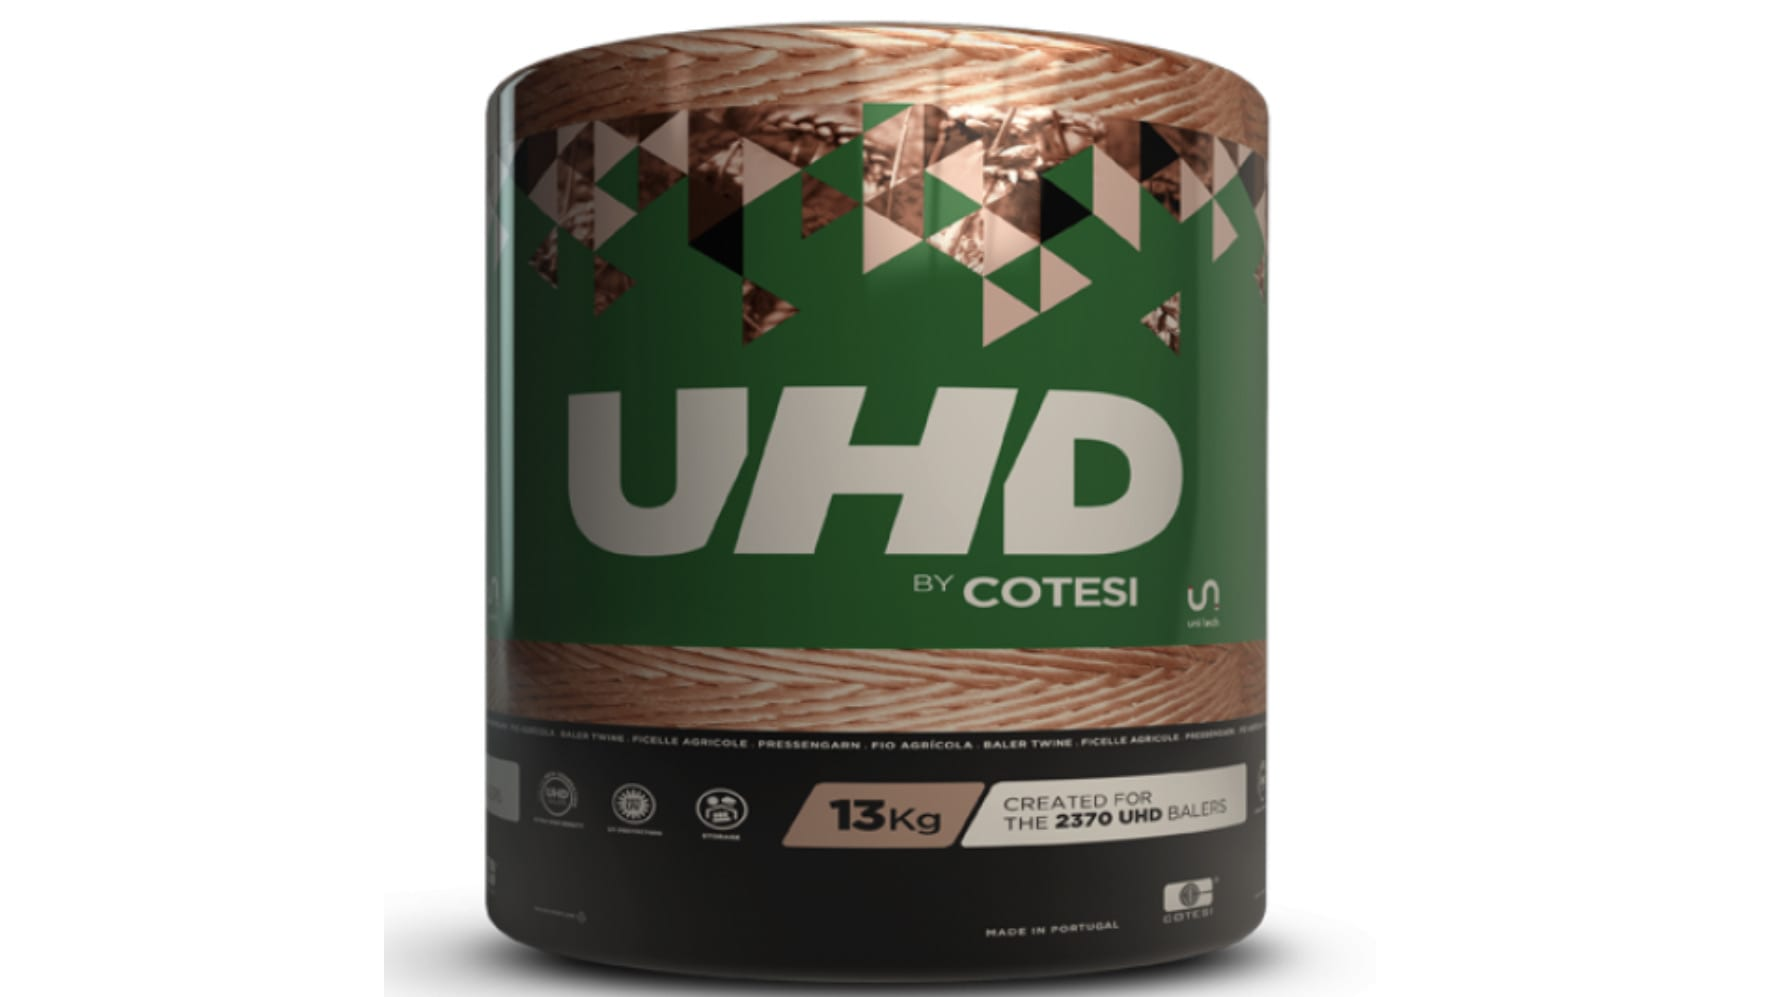 UHD Twine